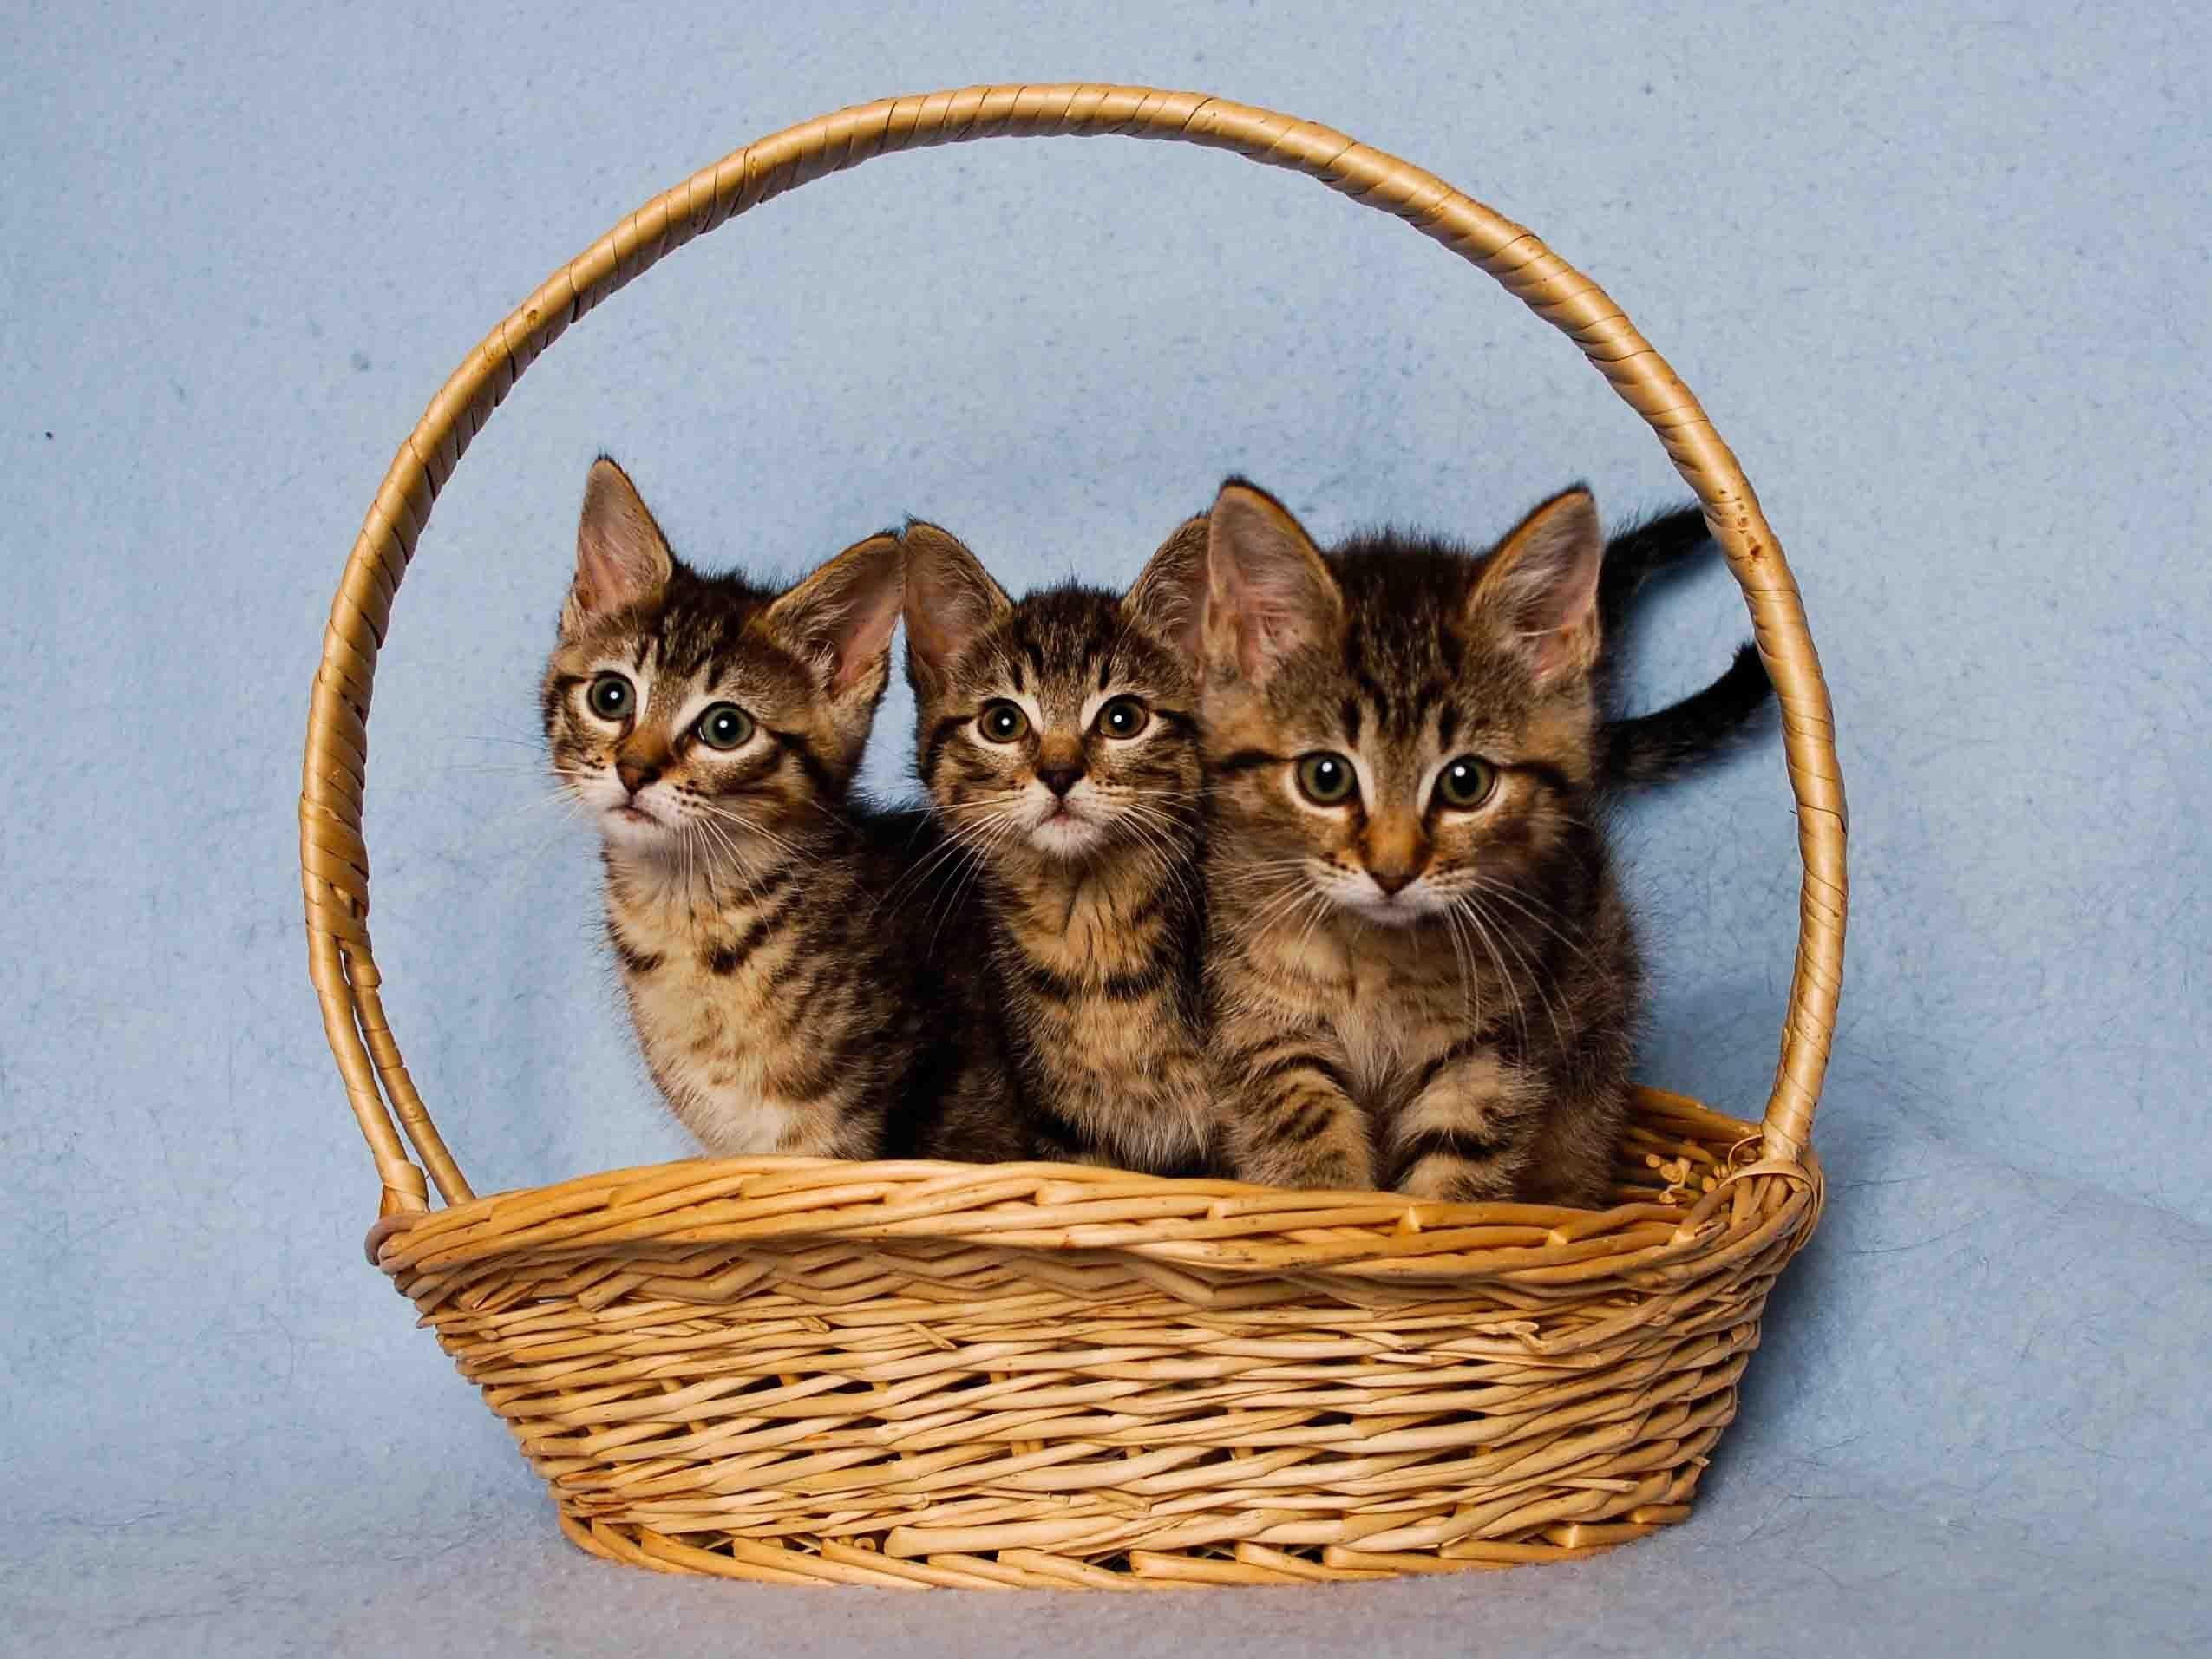 Pets For Adoption At Santa Cruz County Animal Shelter In Santa Cruz Ca Petfinder